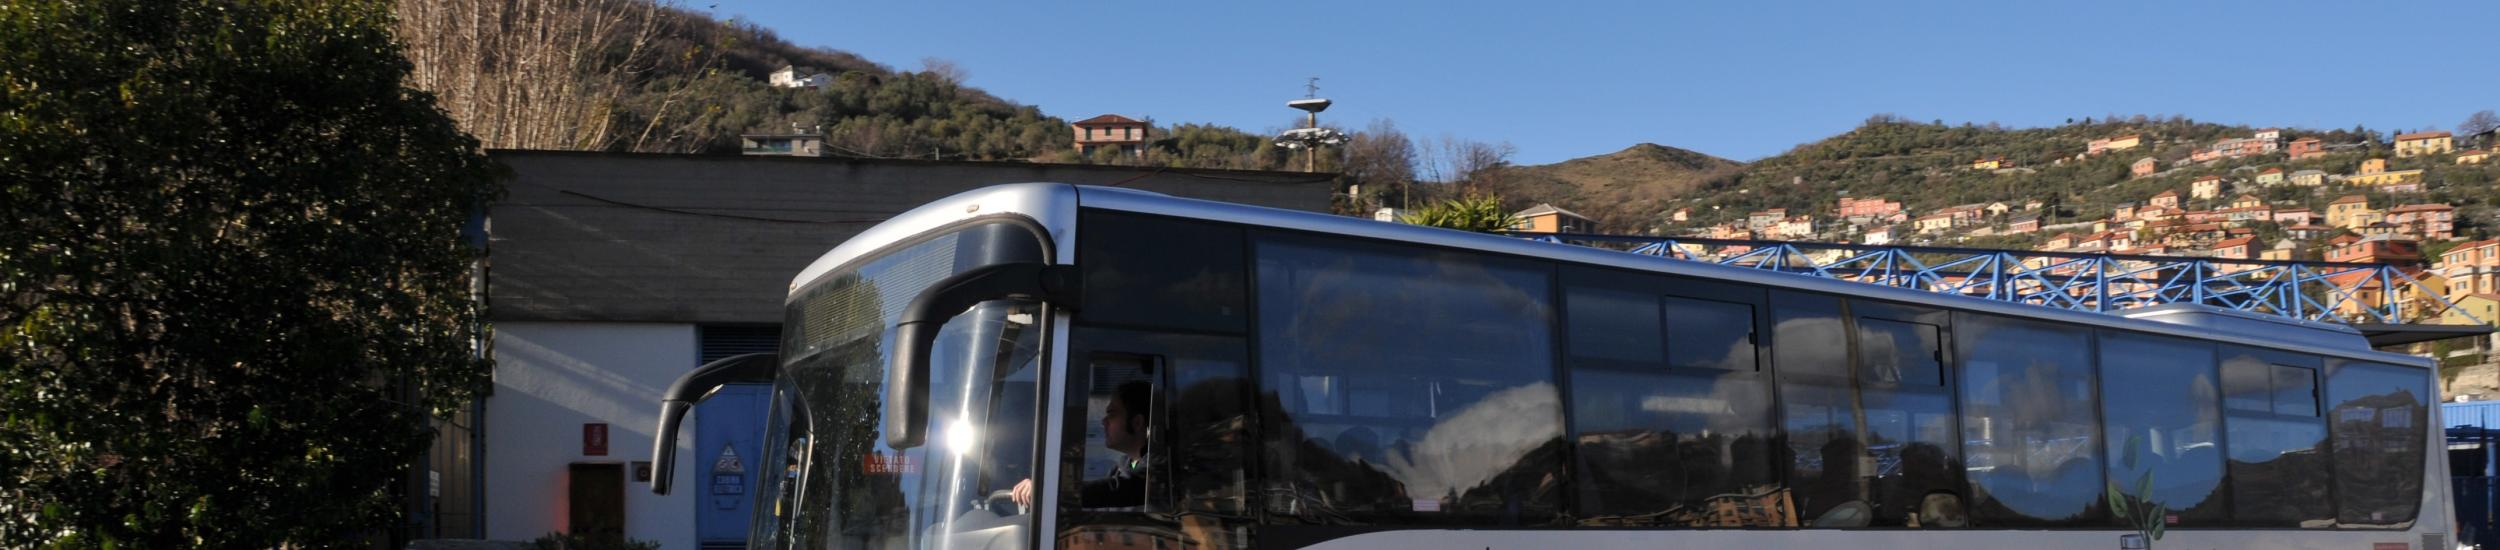 autobus Atp a metano foto 7